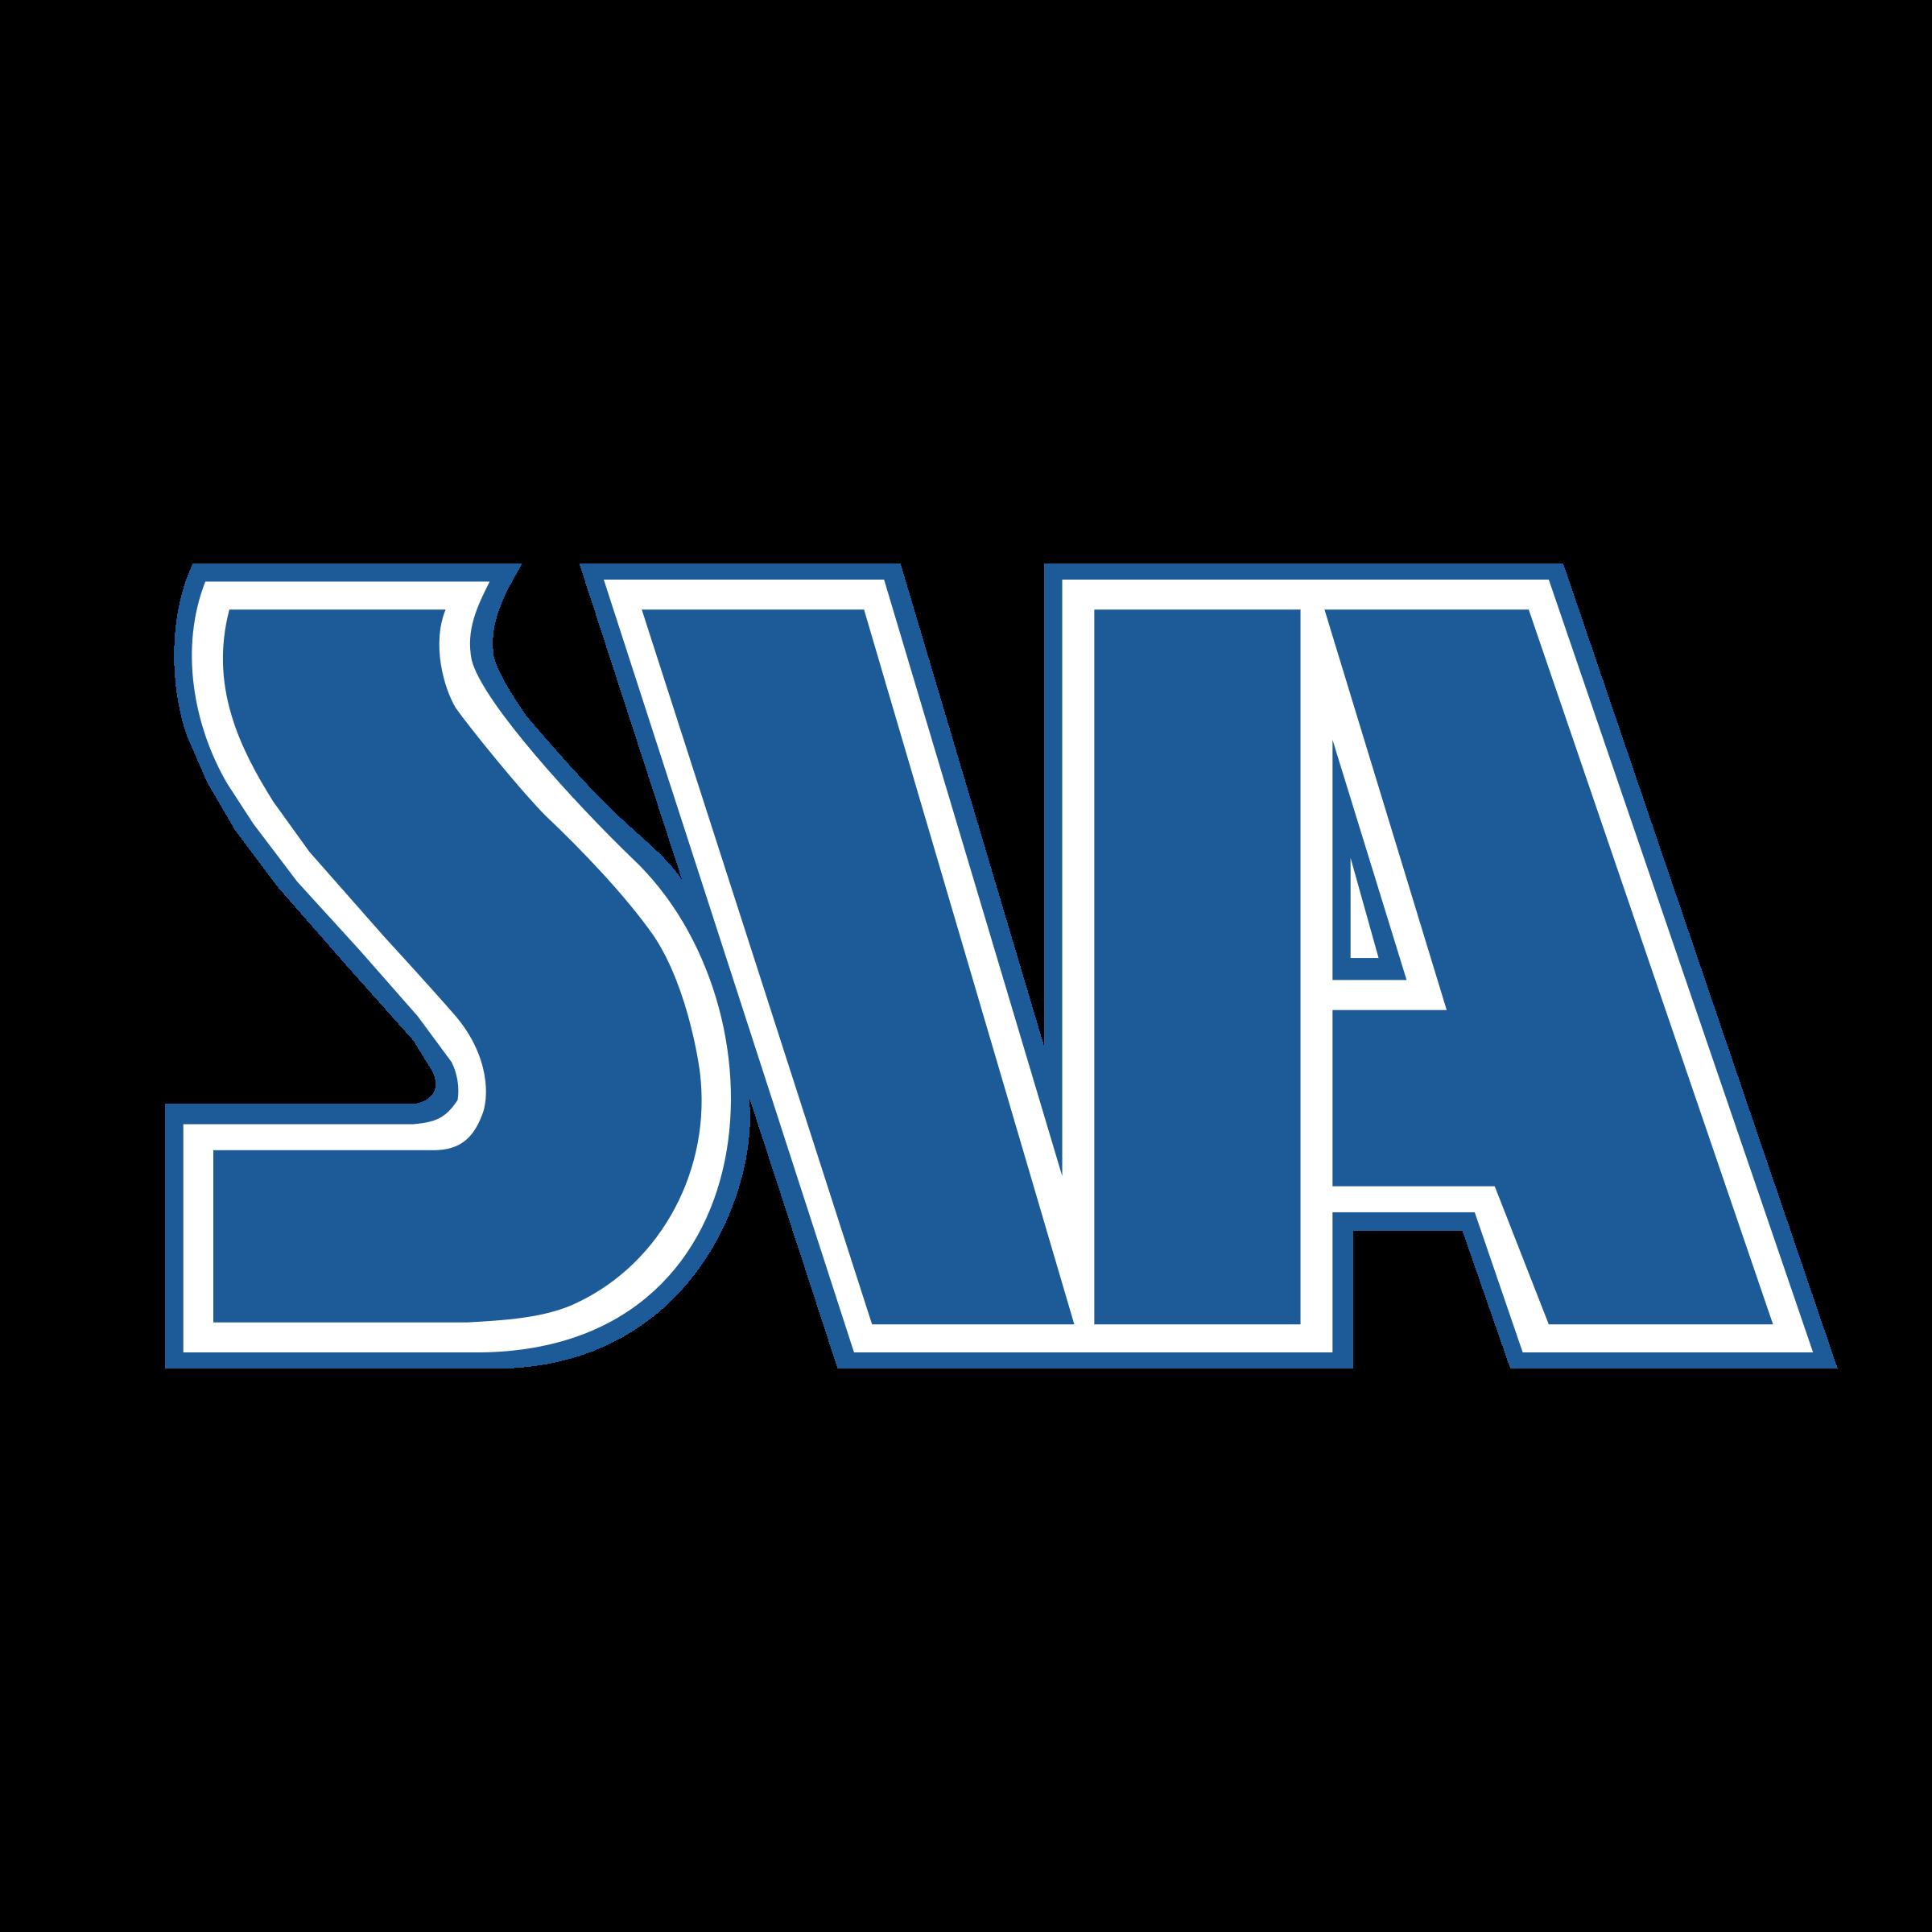 SVA Logo PNG Transparent & SVG Vector.